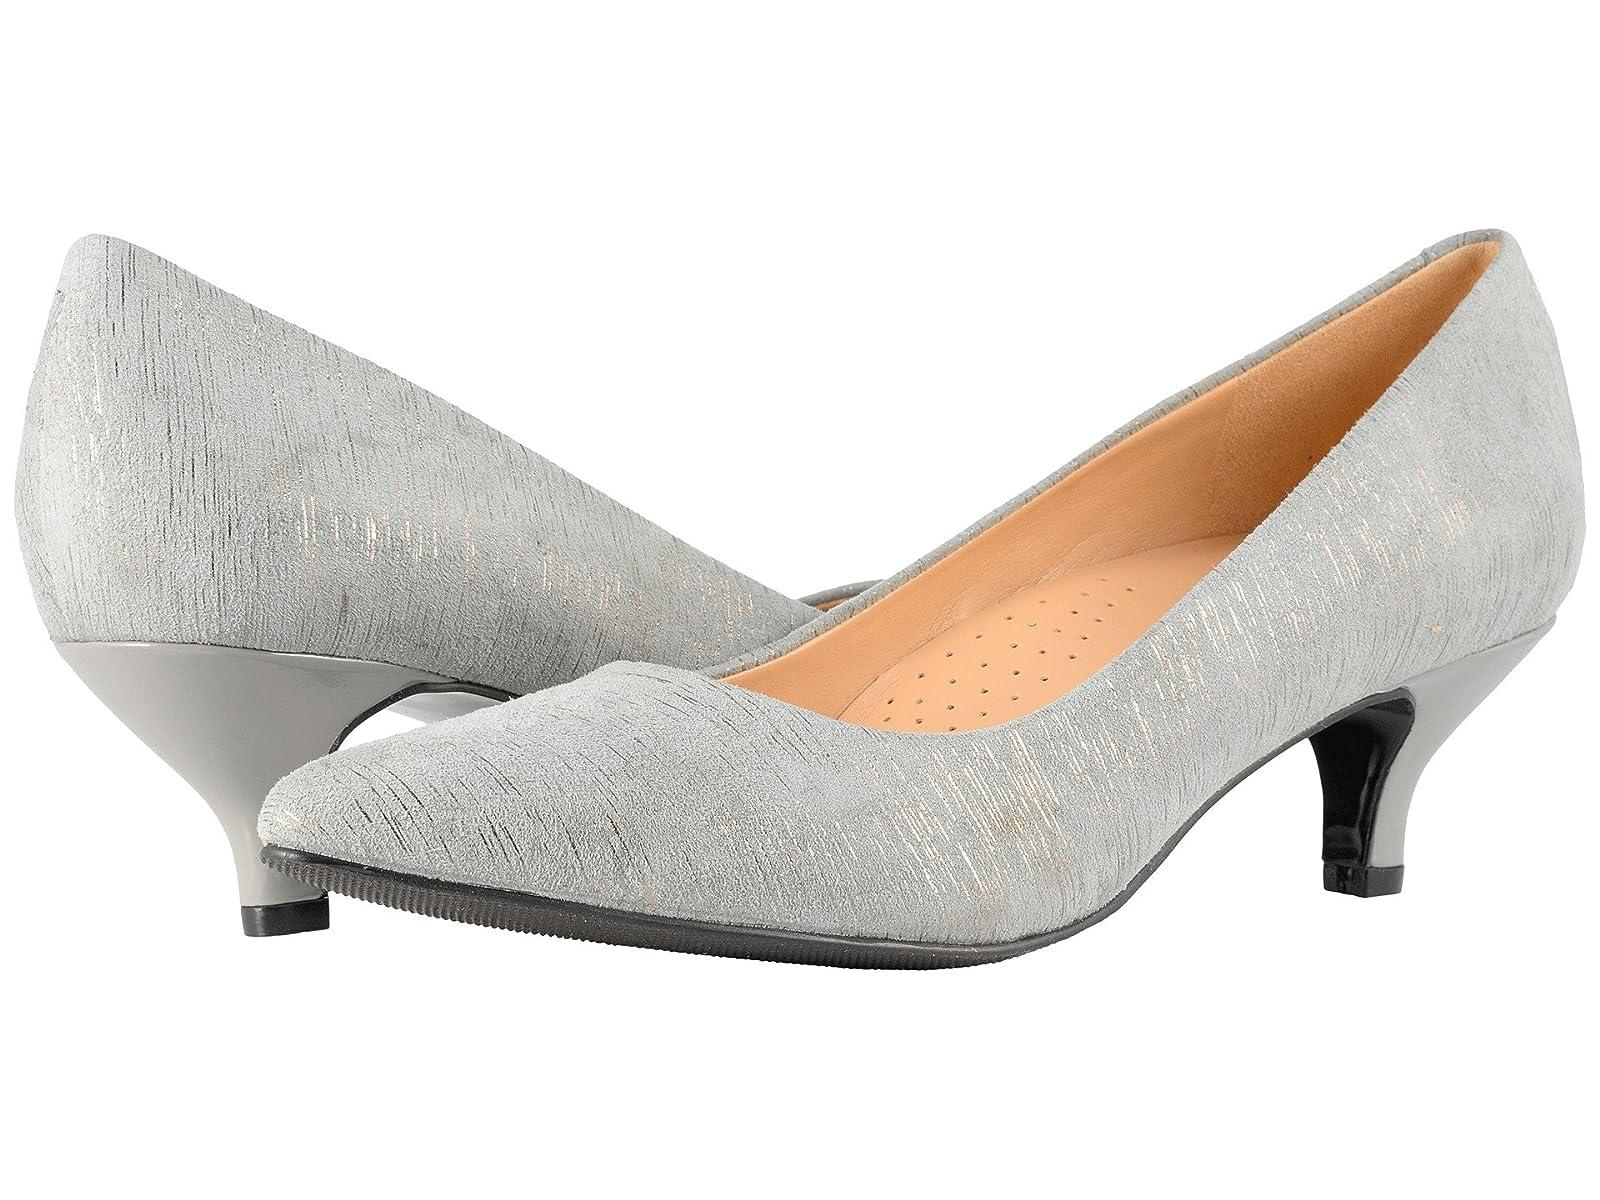 Trotters KieraAtmospheric grades have affordable shoes